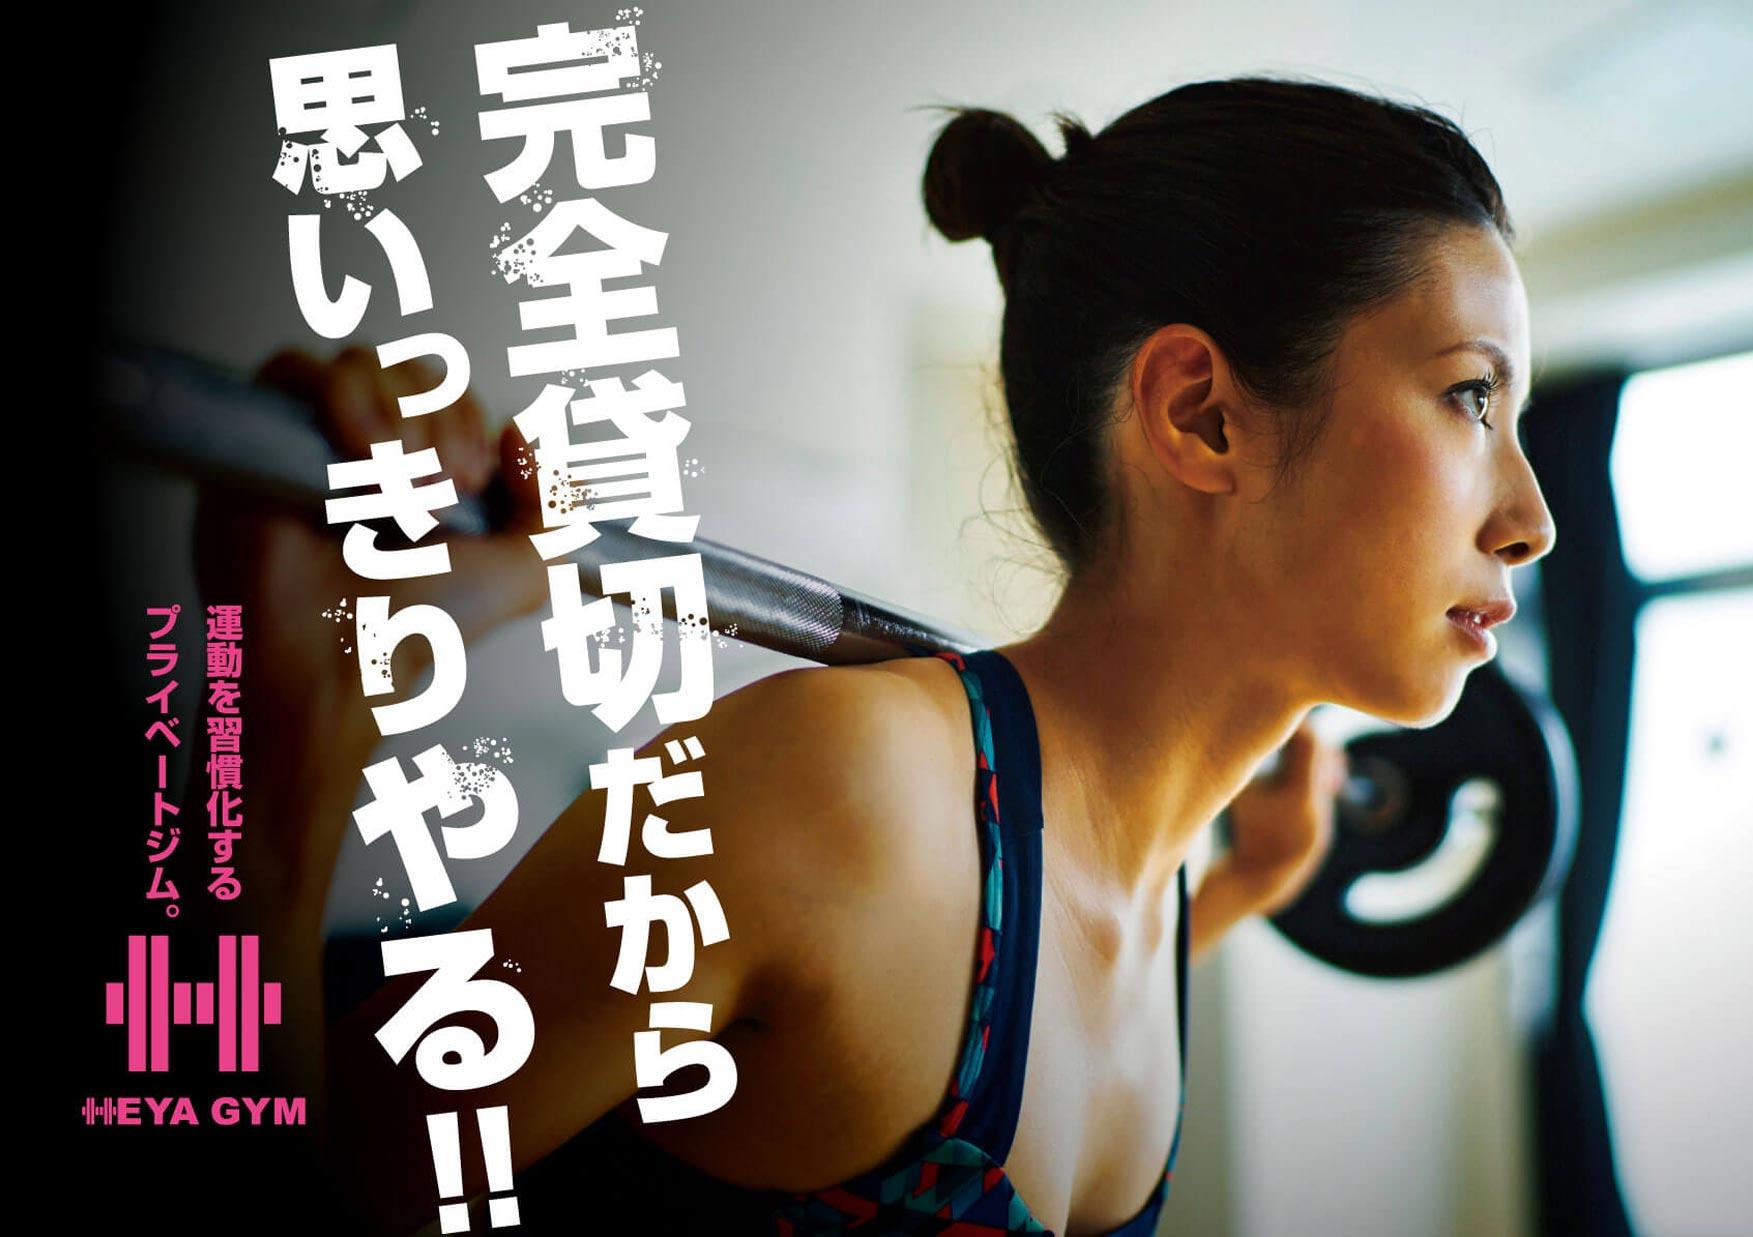 【HEYA GYM】 運動を習慣化するプライベートジム「ヘヤジム」